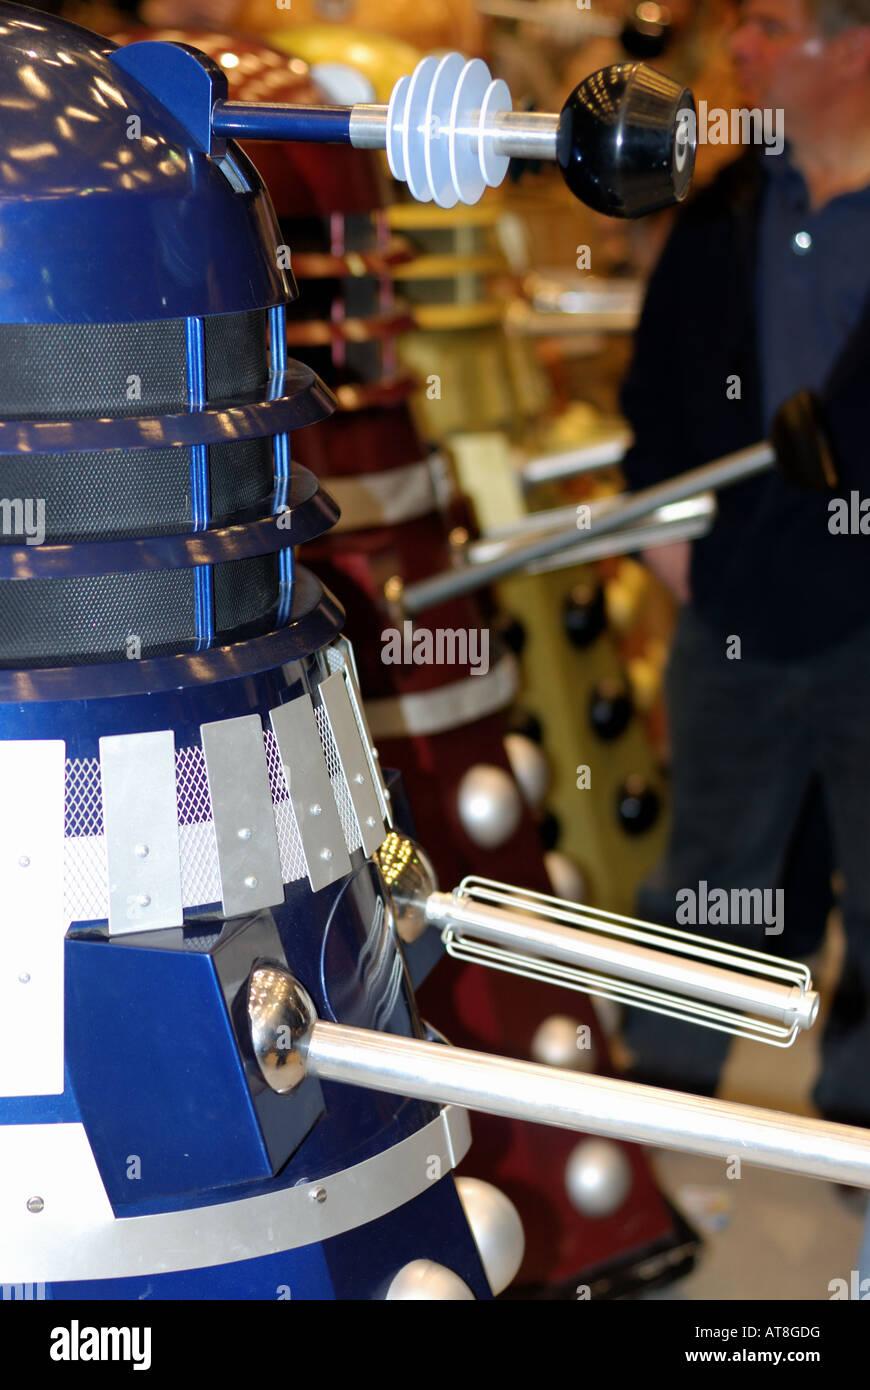 Dalek at toy fair - Stock Image